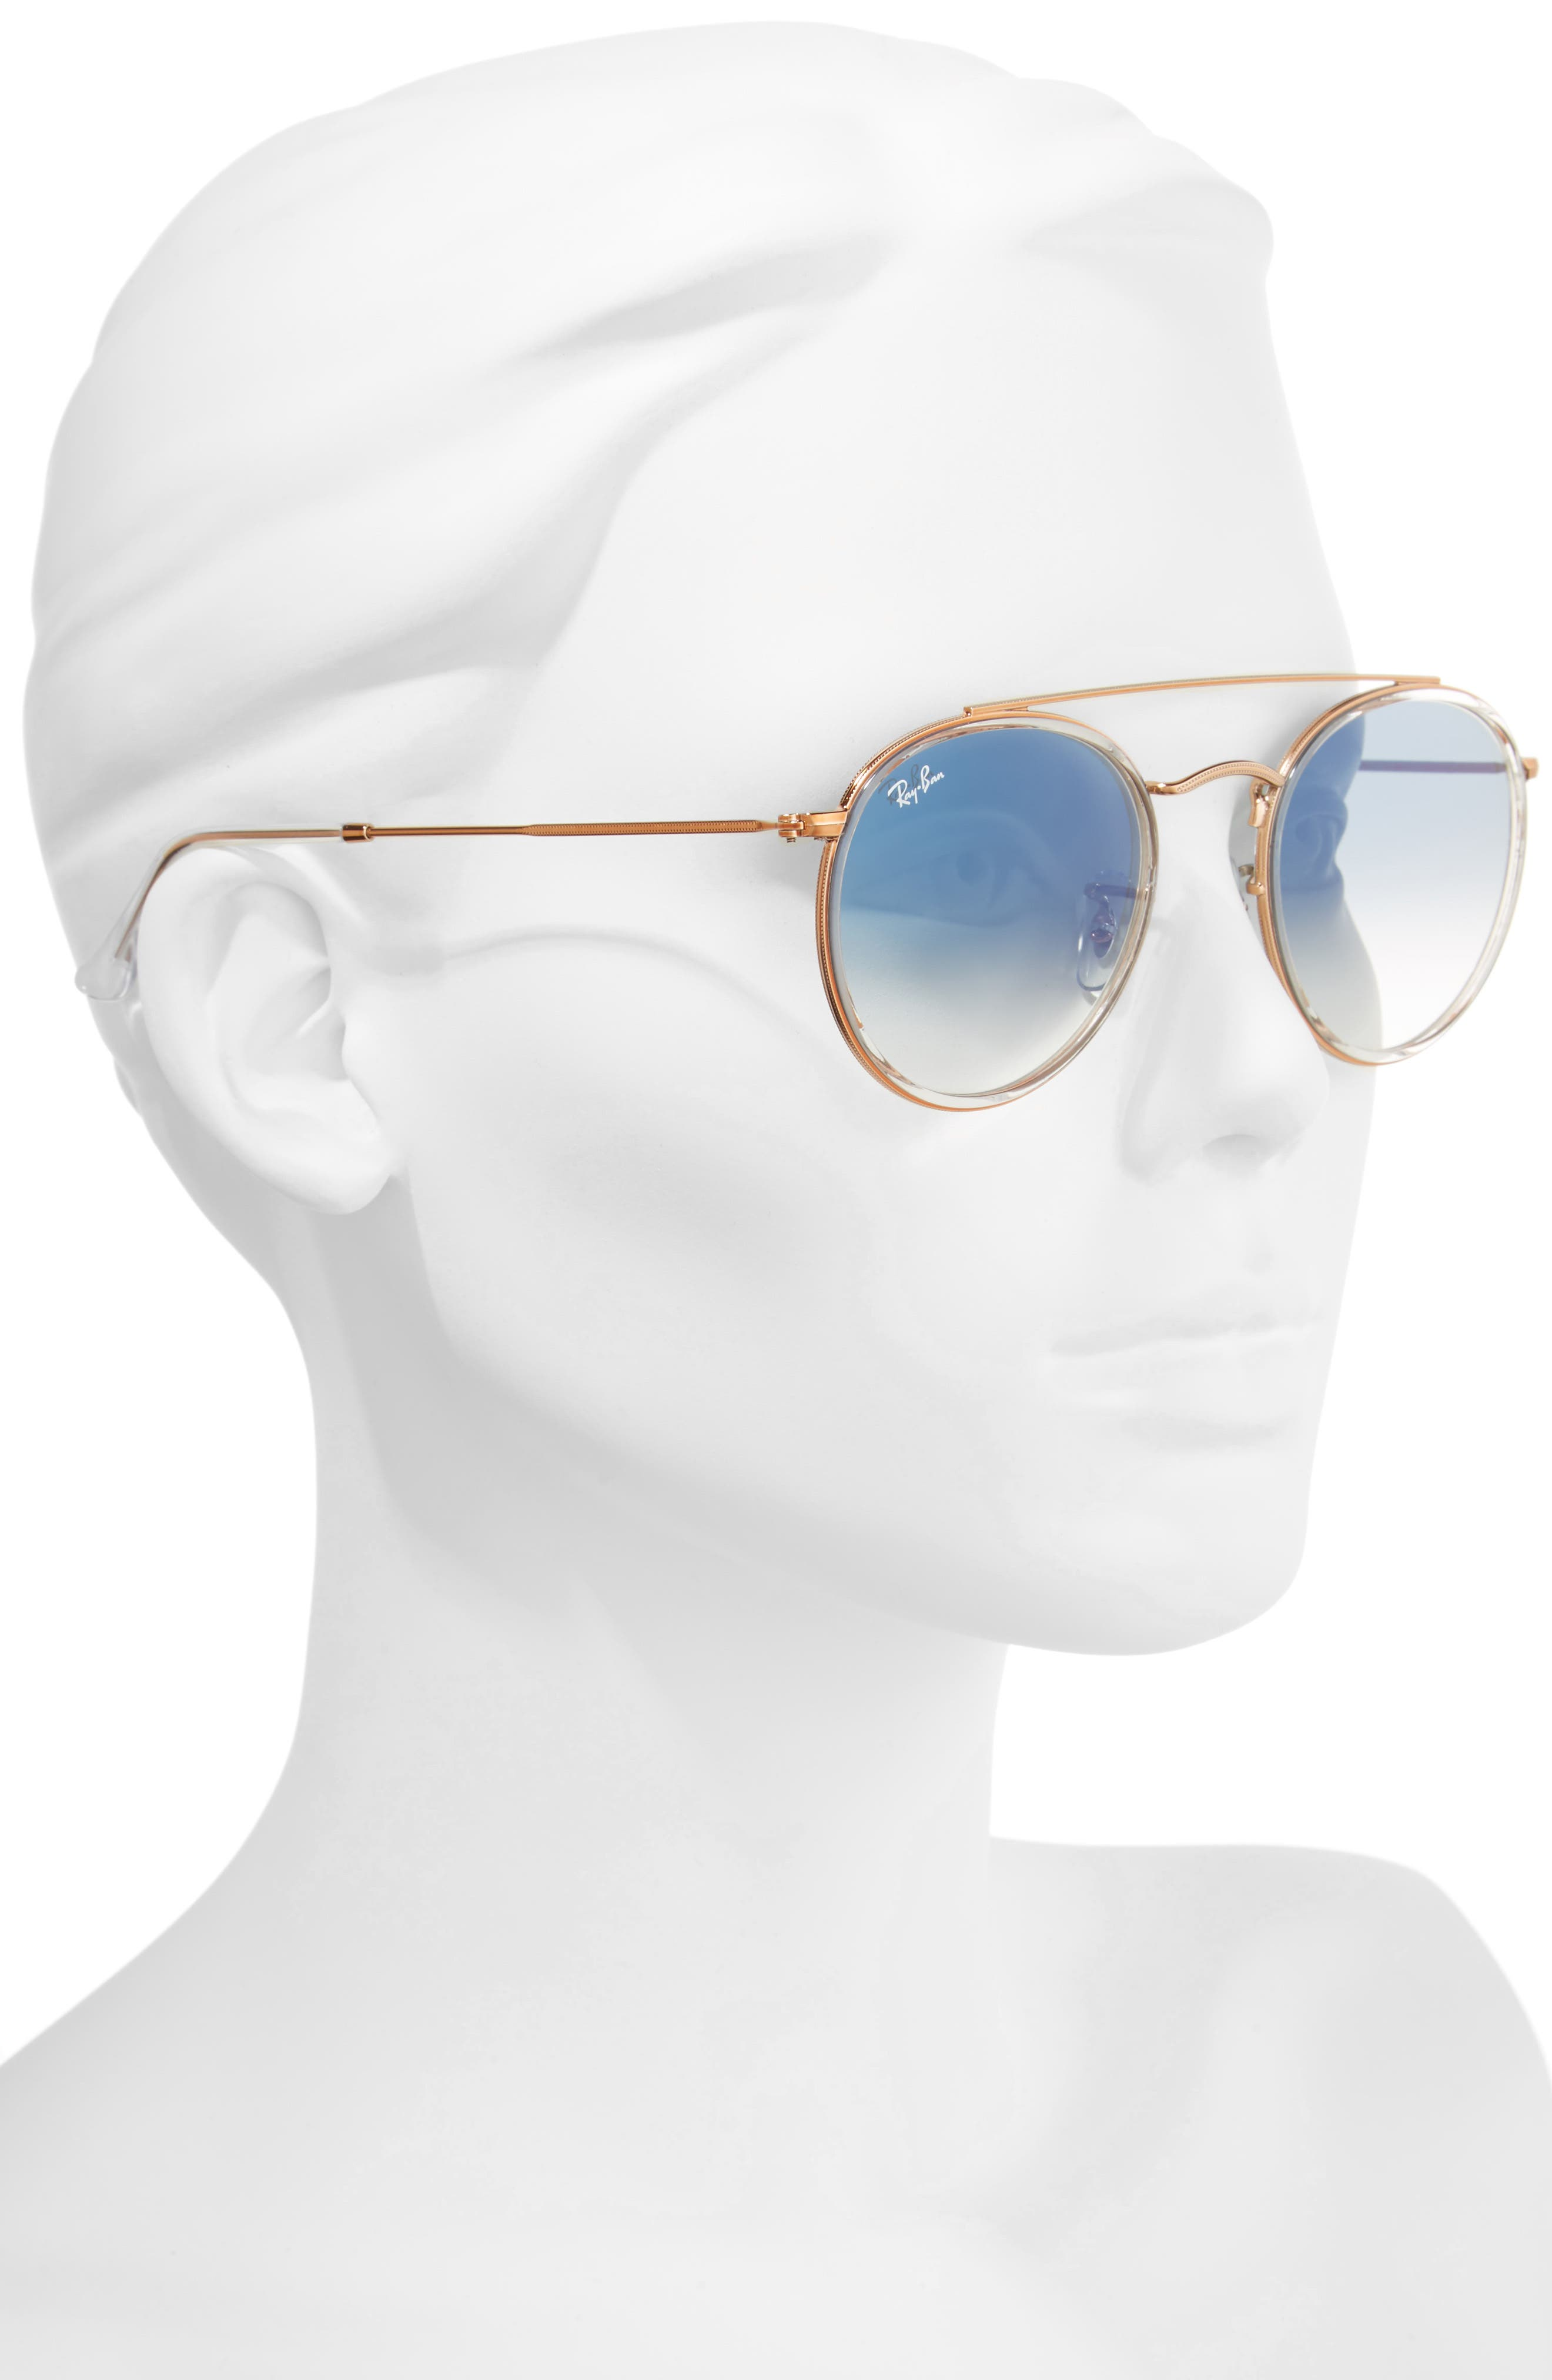 51mm Aviator Gradient Lens Sunglasses,                             Alternate thumbnail 2, color,                             Blue Transparent